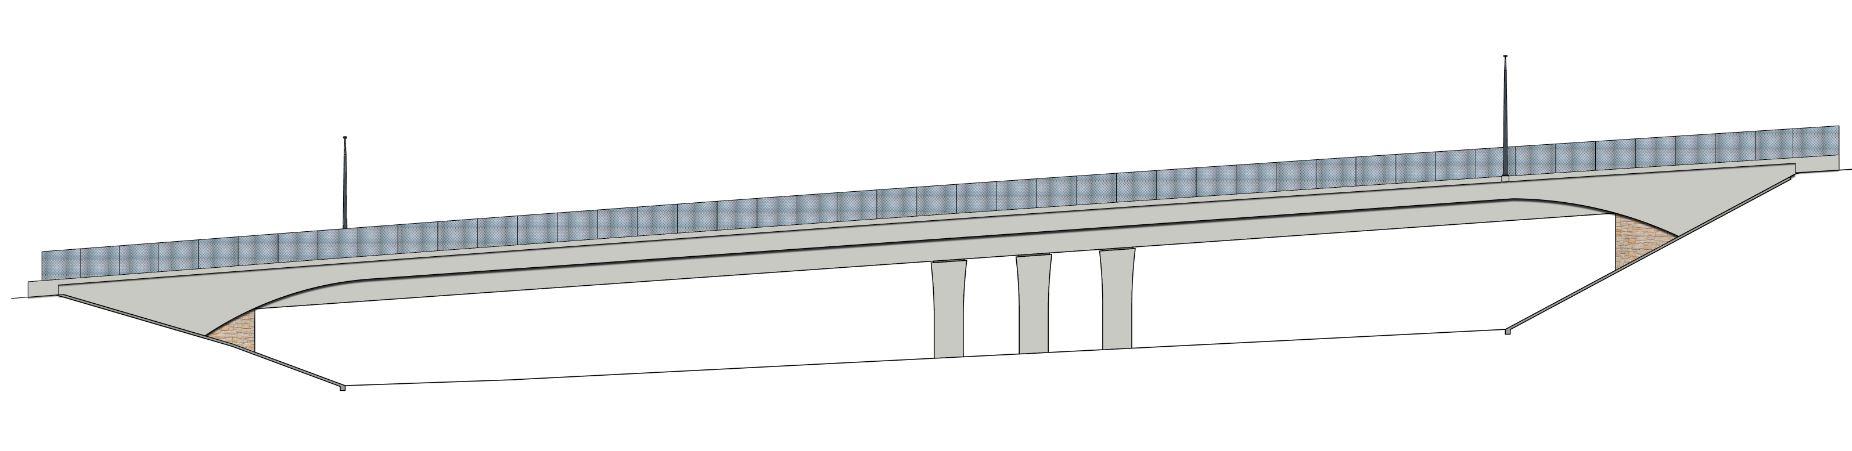 Bridge Profile.JPG